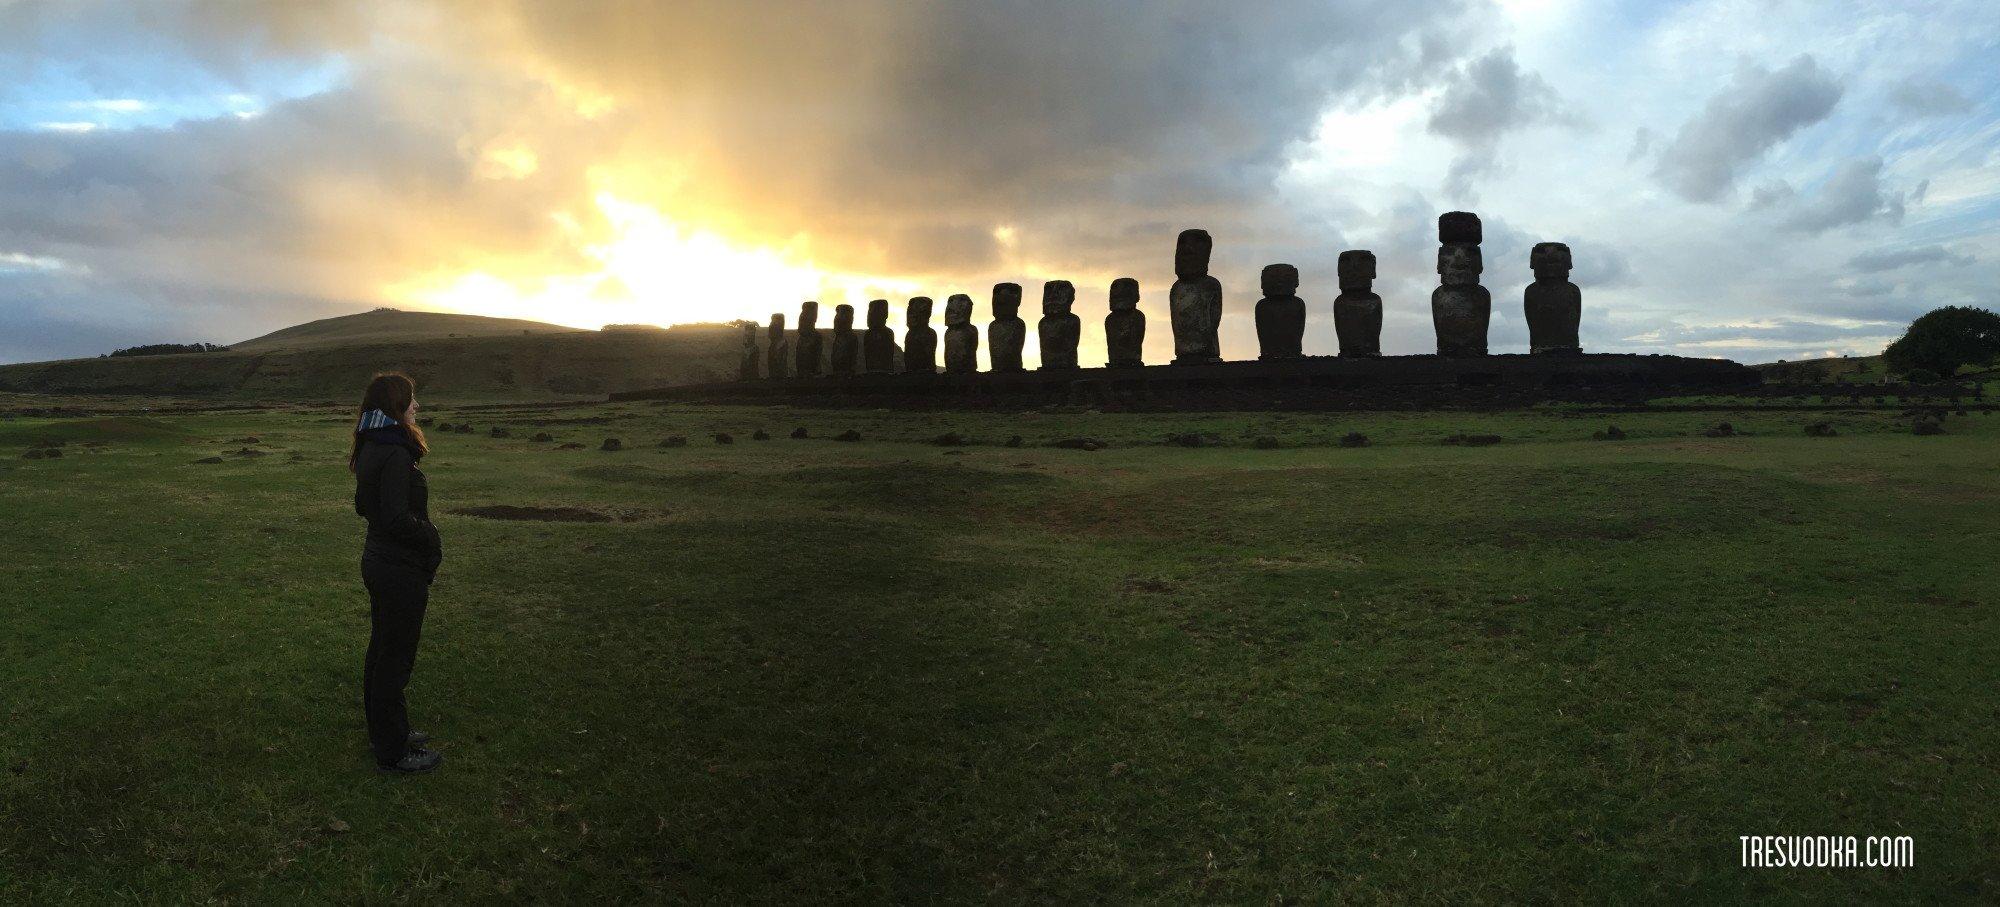 Wyspa Wielkanocna – preludium